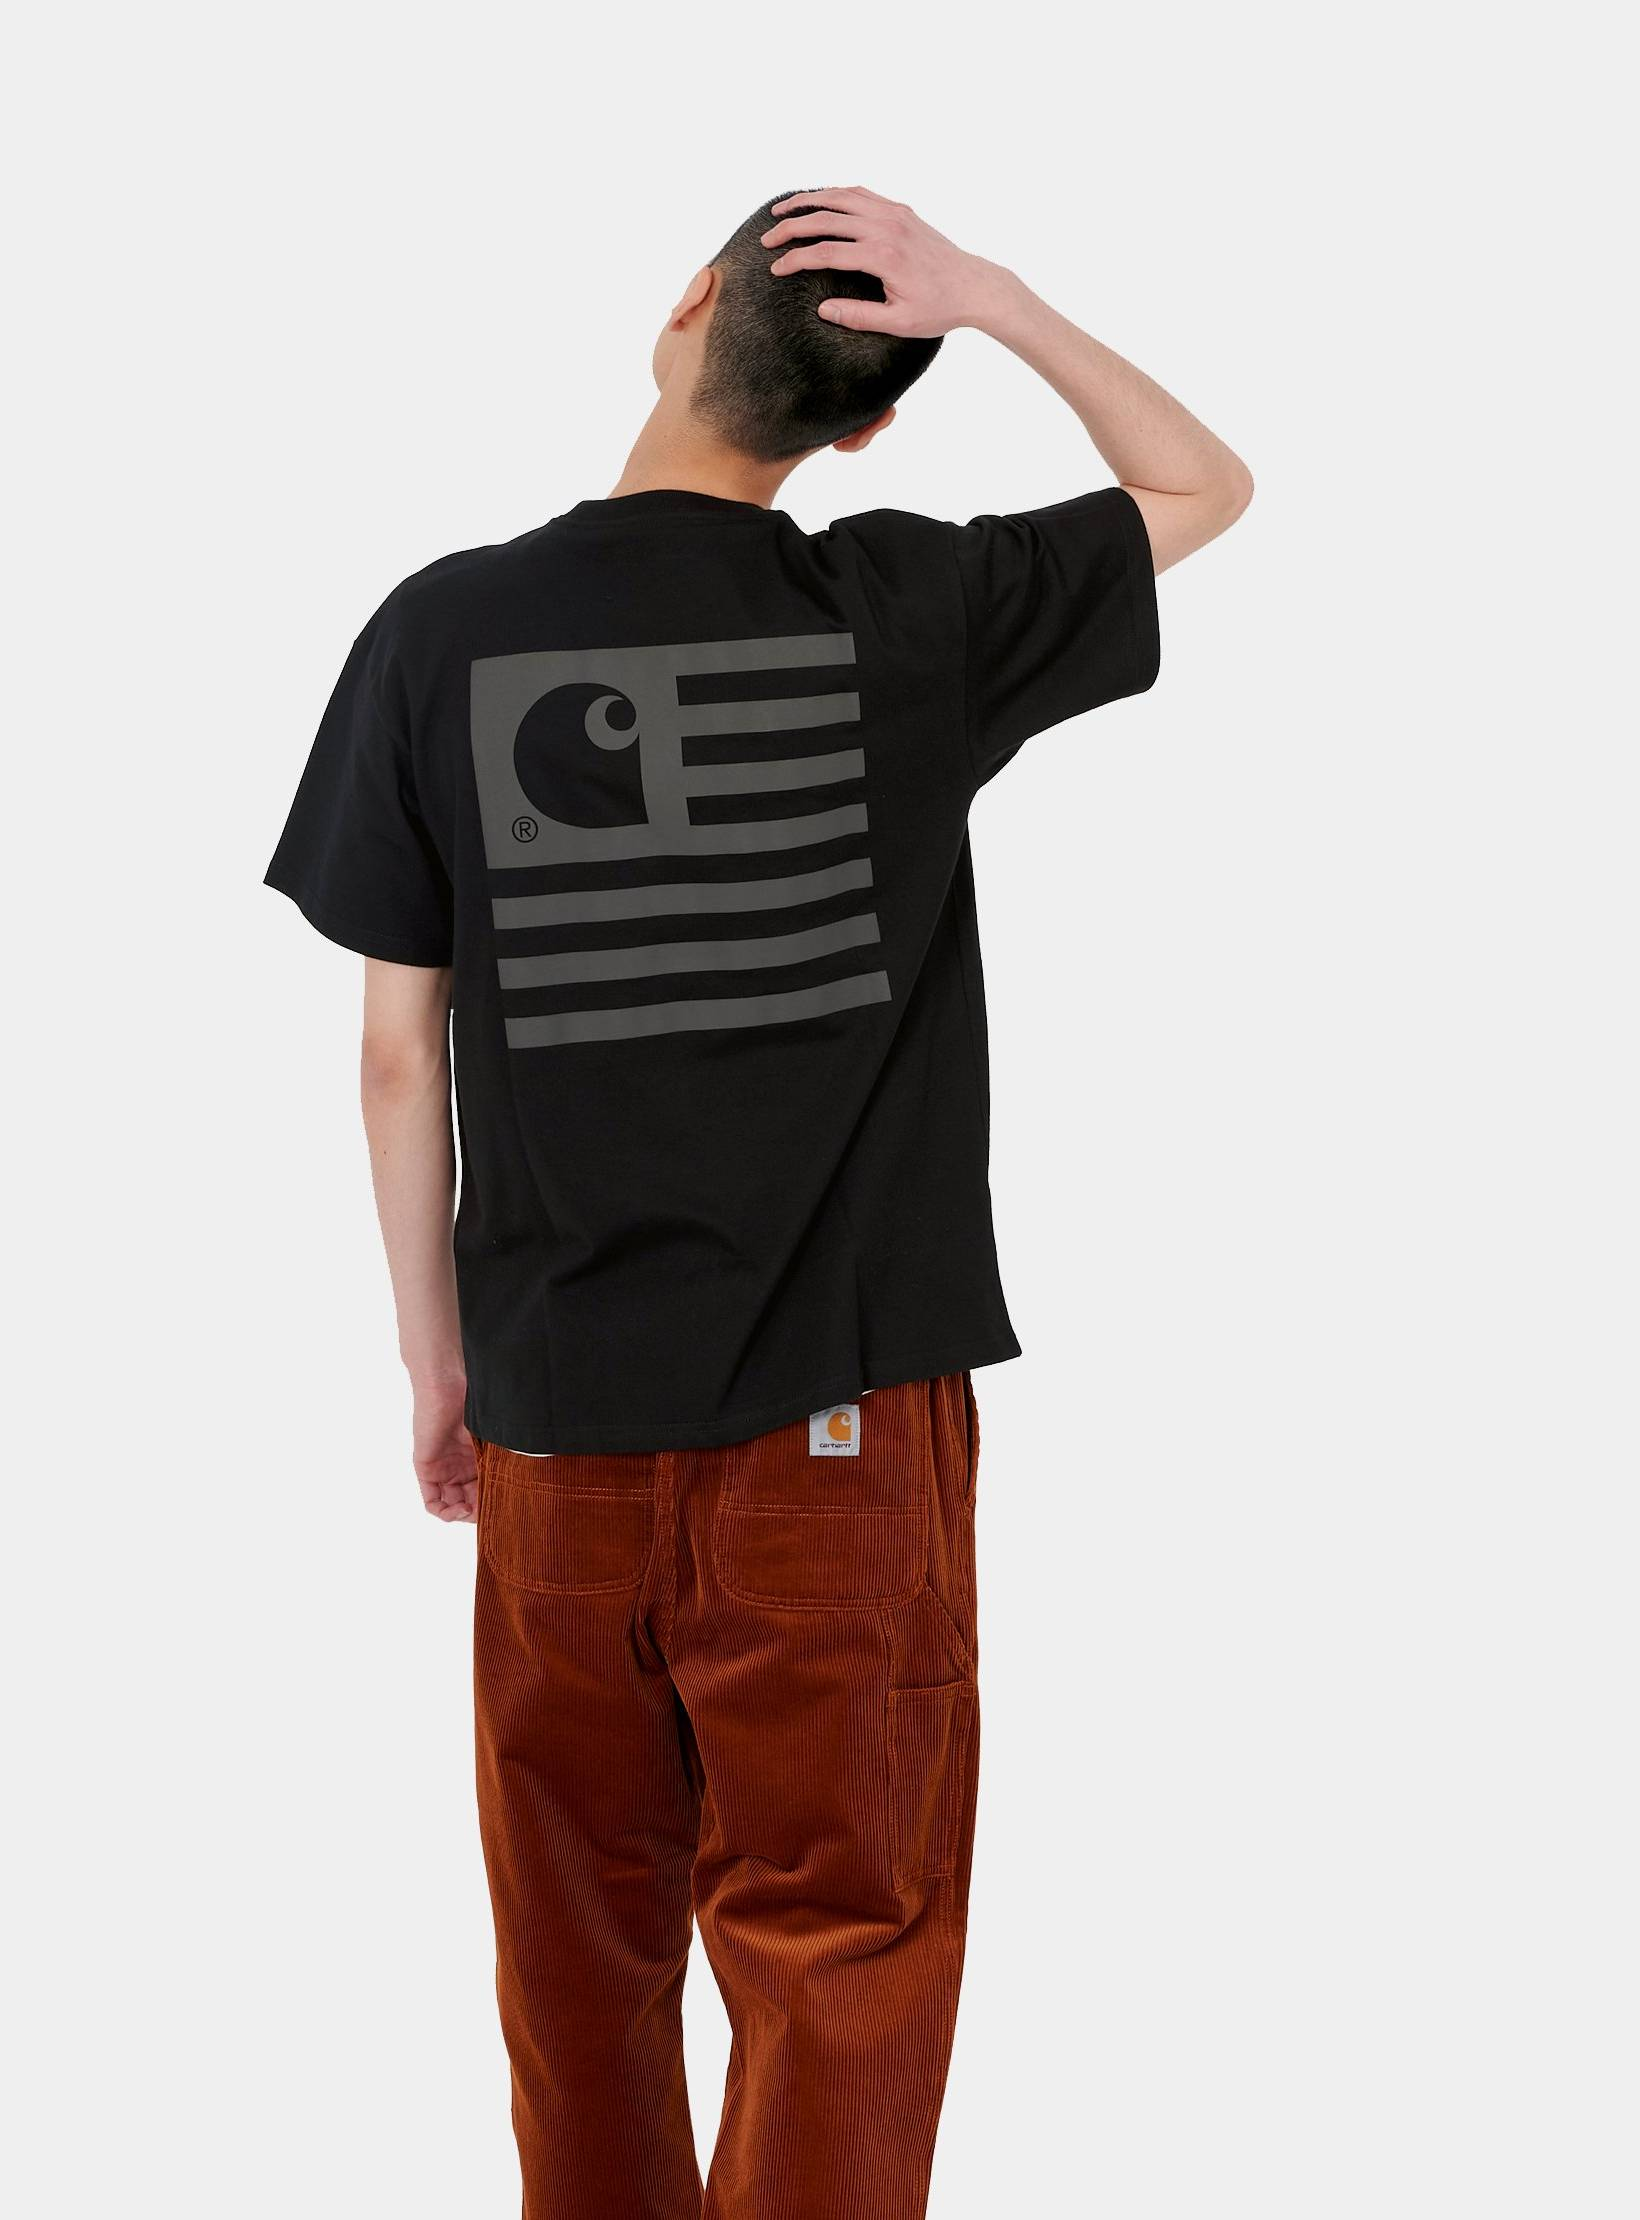 "avec /""CARHARTT être légendaire depuis 1899/' T-shirt Carhartt t-shirt manches courtes"